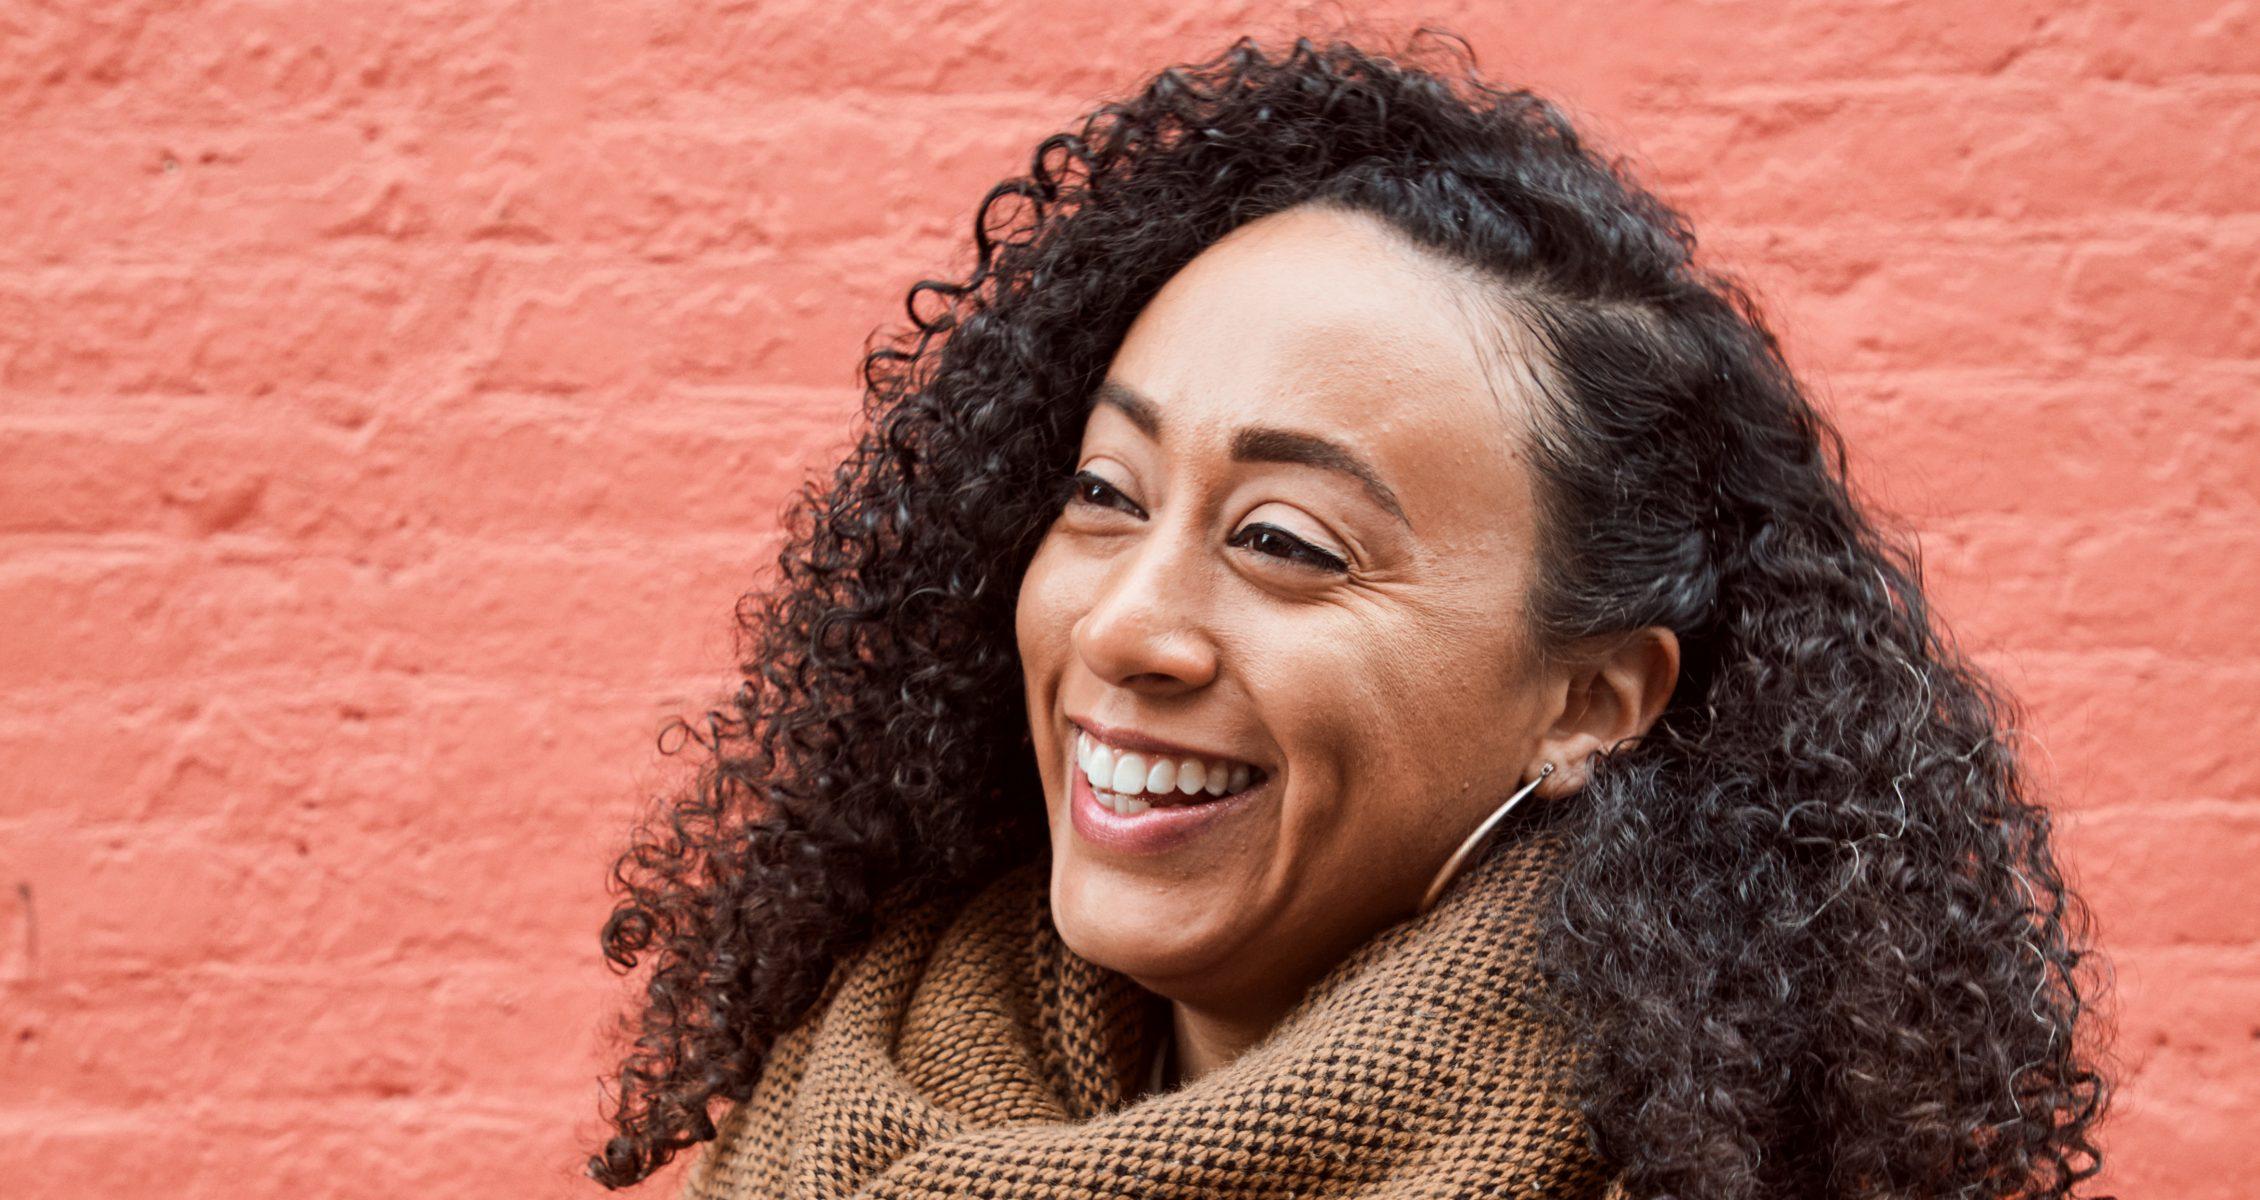 Prose DTTR Myriam smile